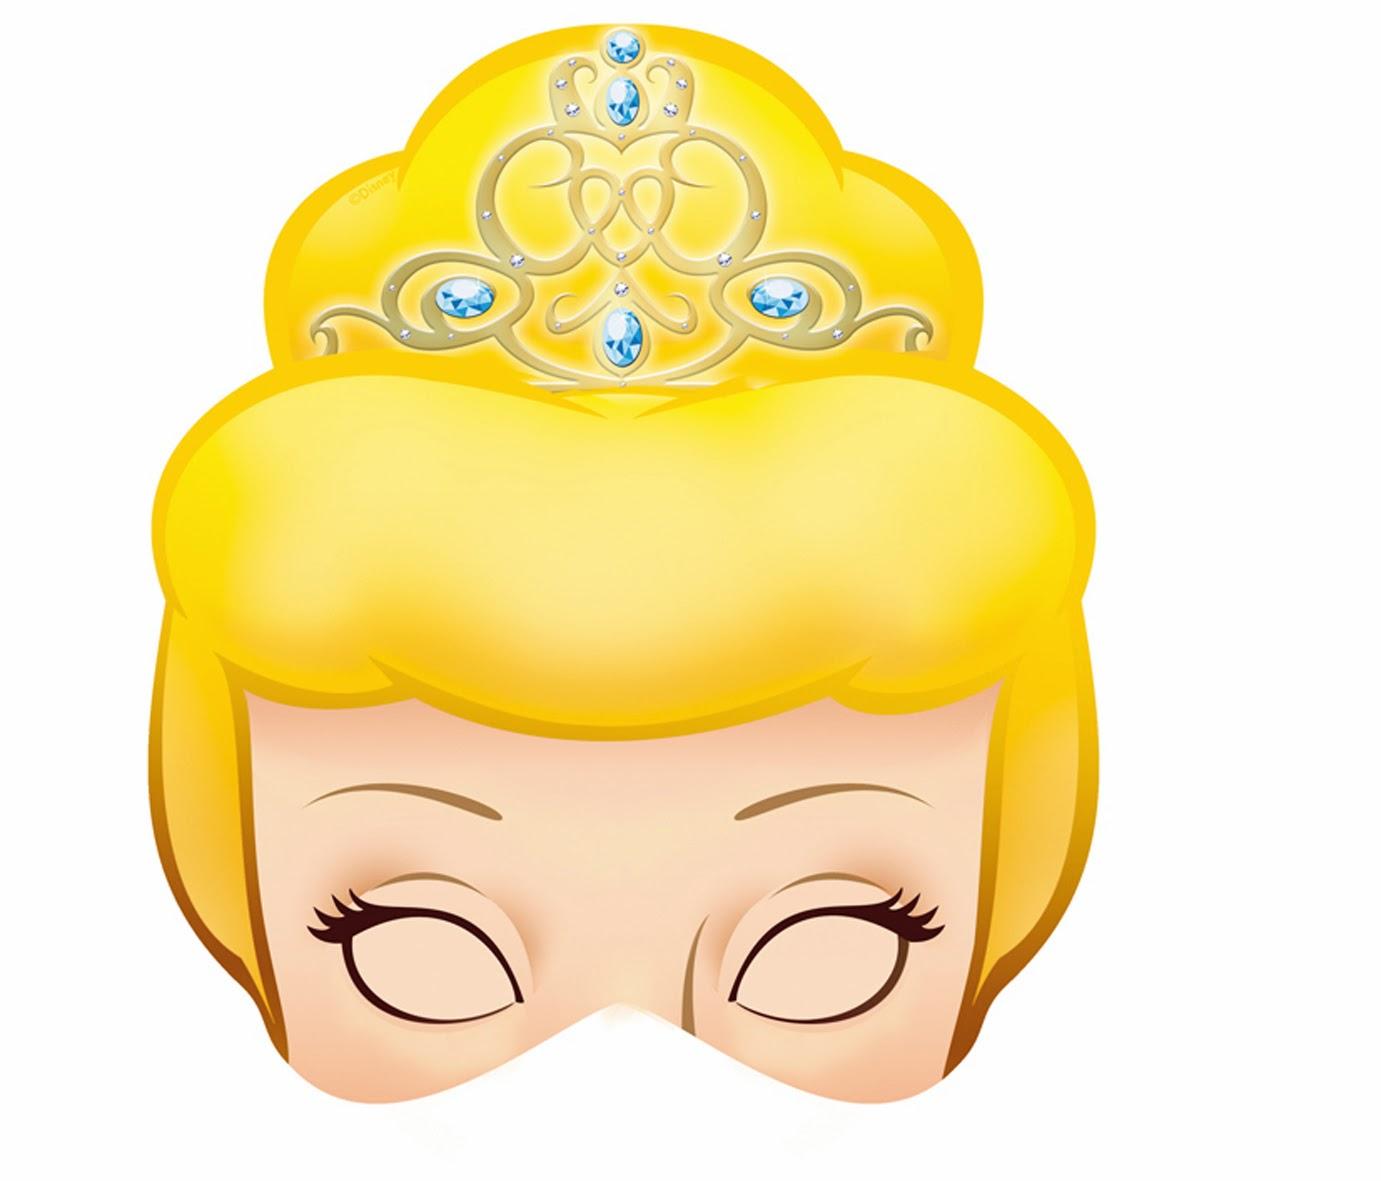 Cinderella Free Printable Masks. | Oh My Fiesta! In English - Free Printable Wizard Of Oz Masks